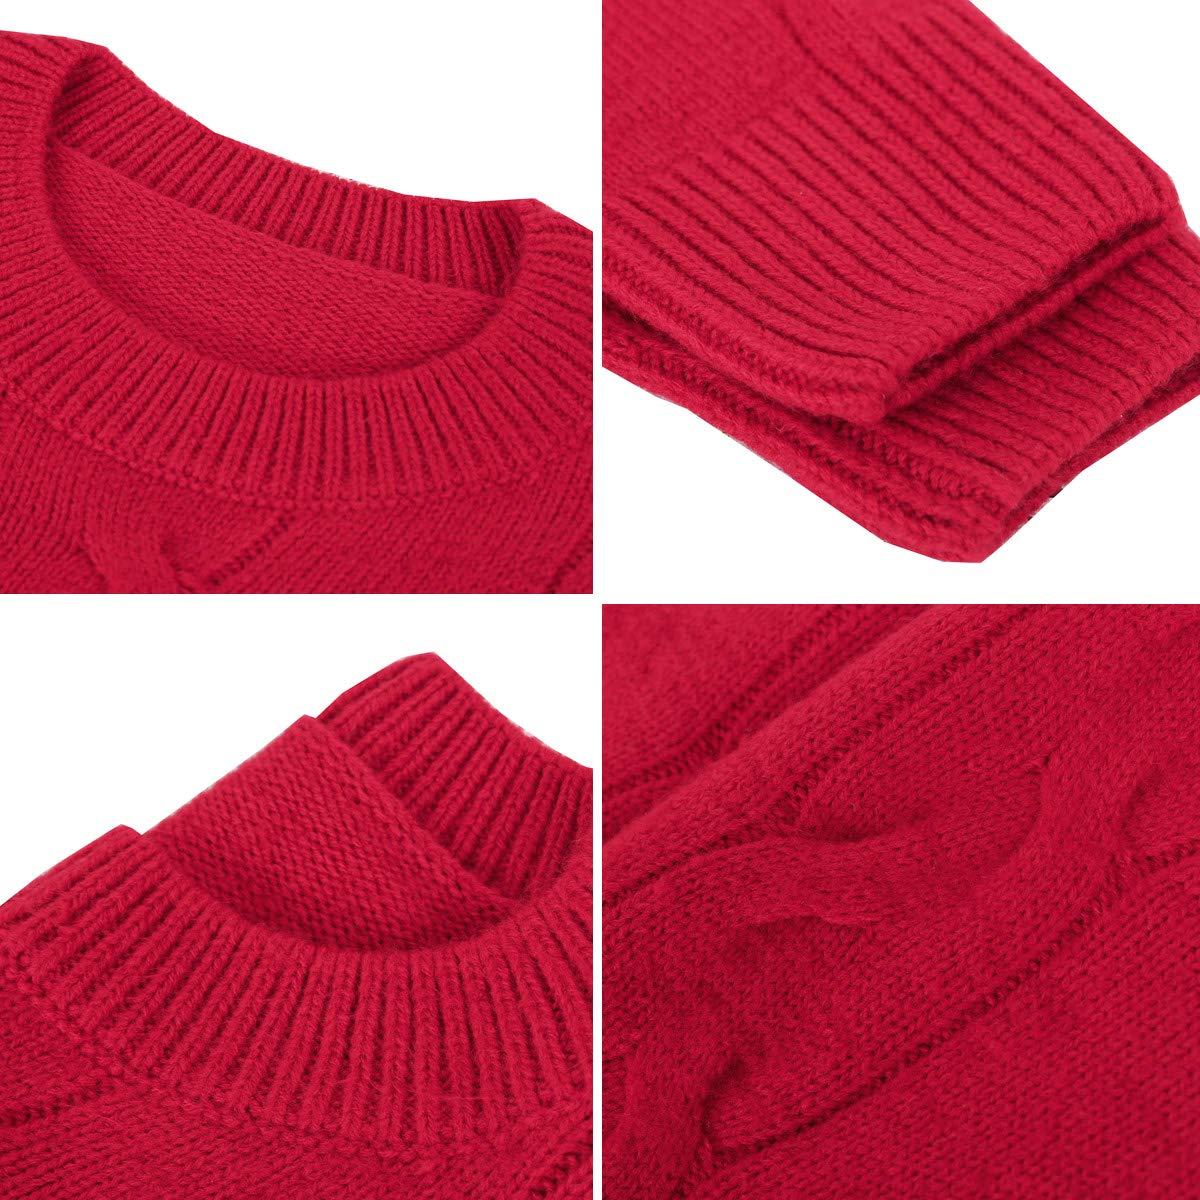 Short Sweater (Red, Medium)